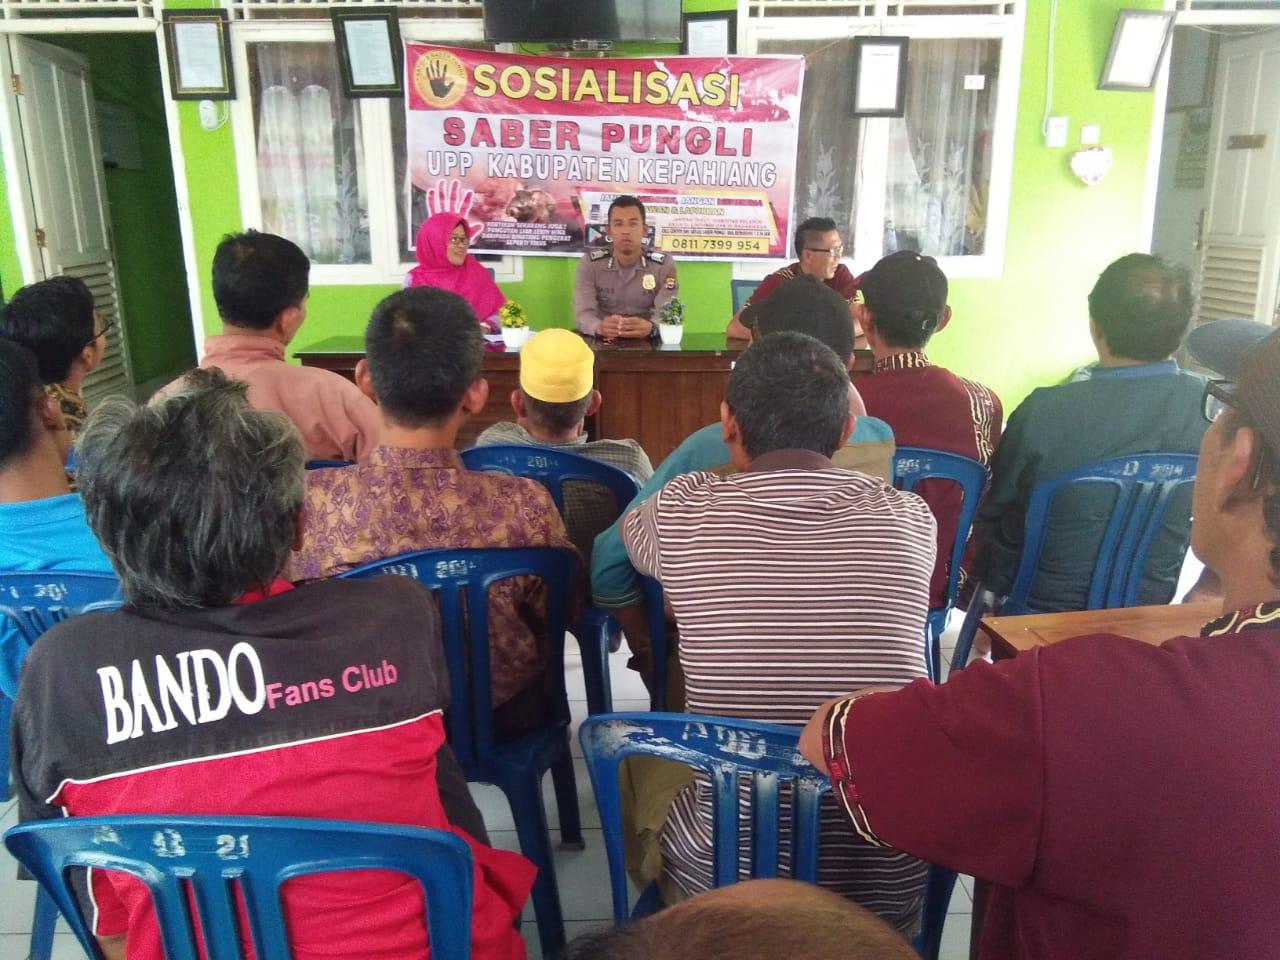 Sosialisasi Saber Pungli, UPP Kepahiang Giatkan Pencegahan